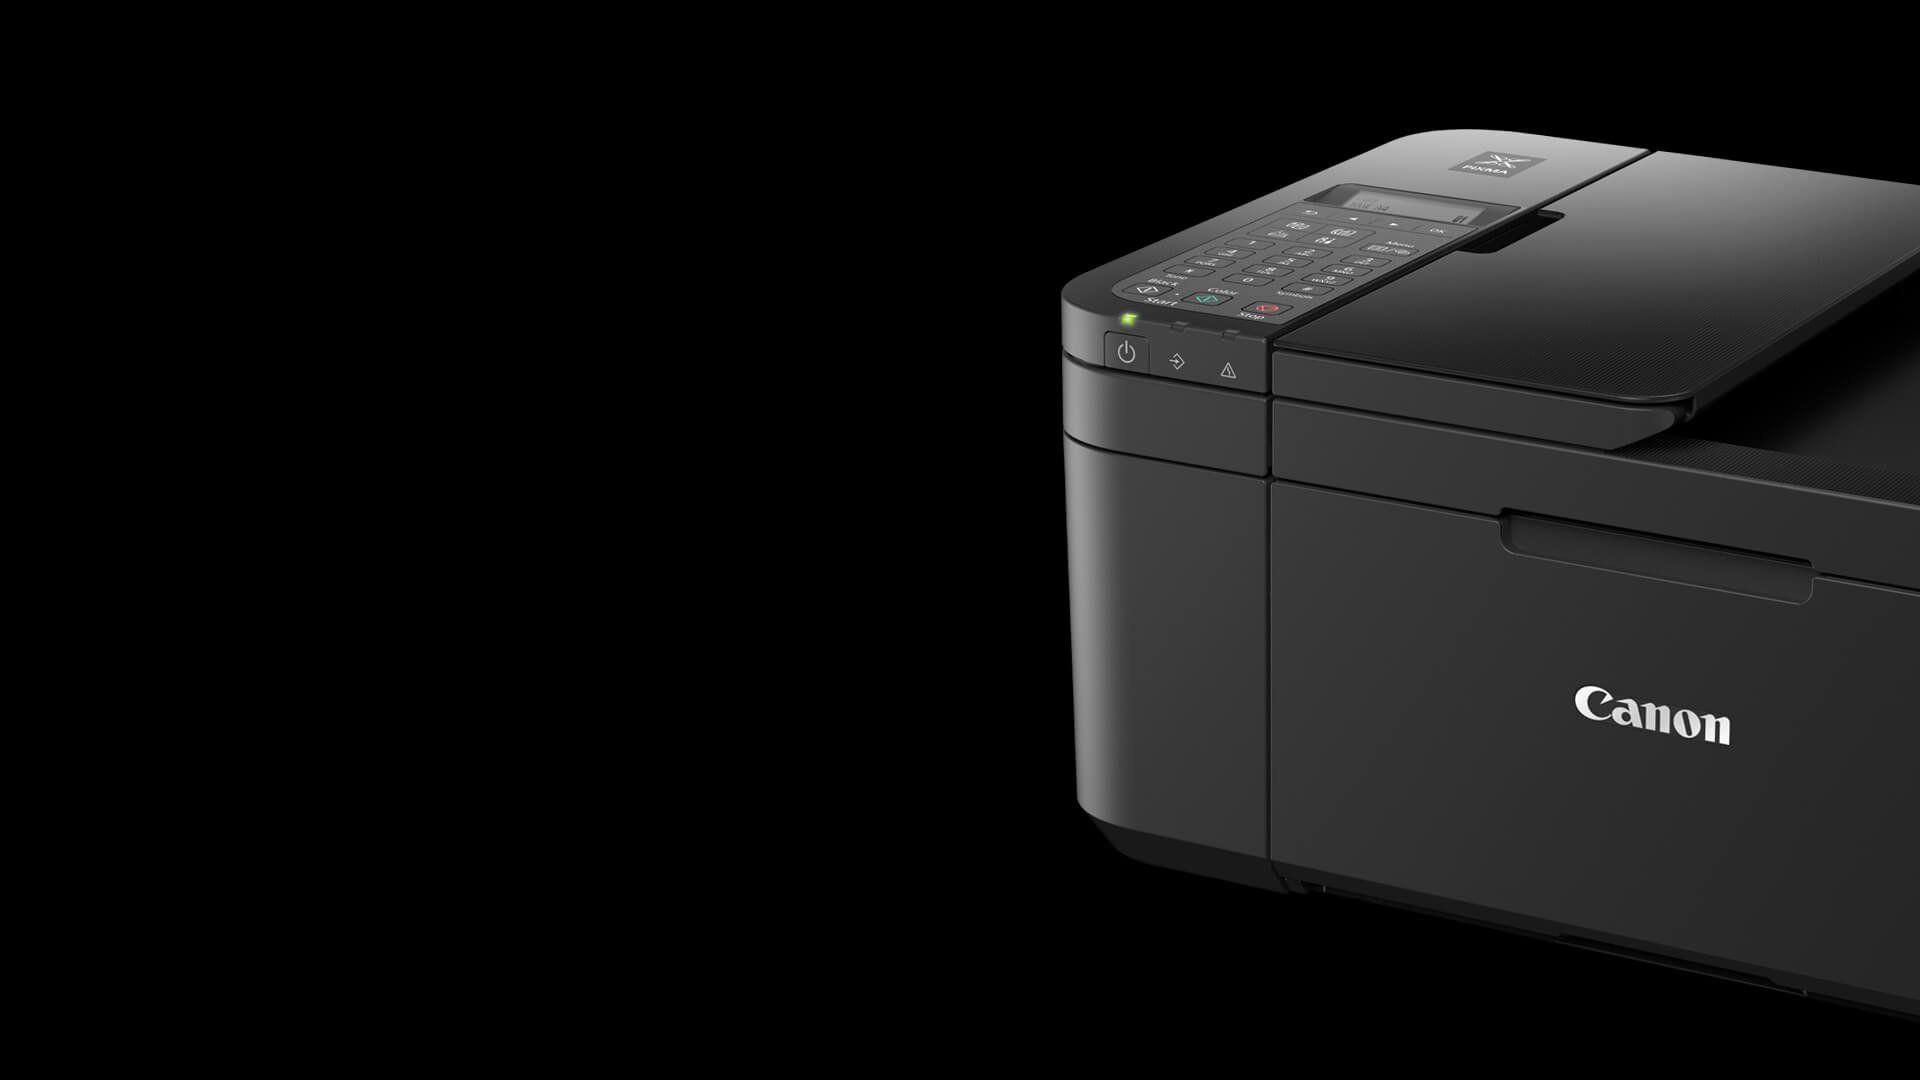 Canon Printer Error Code 6000 - How to fix